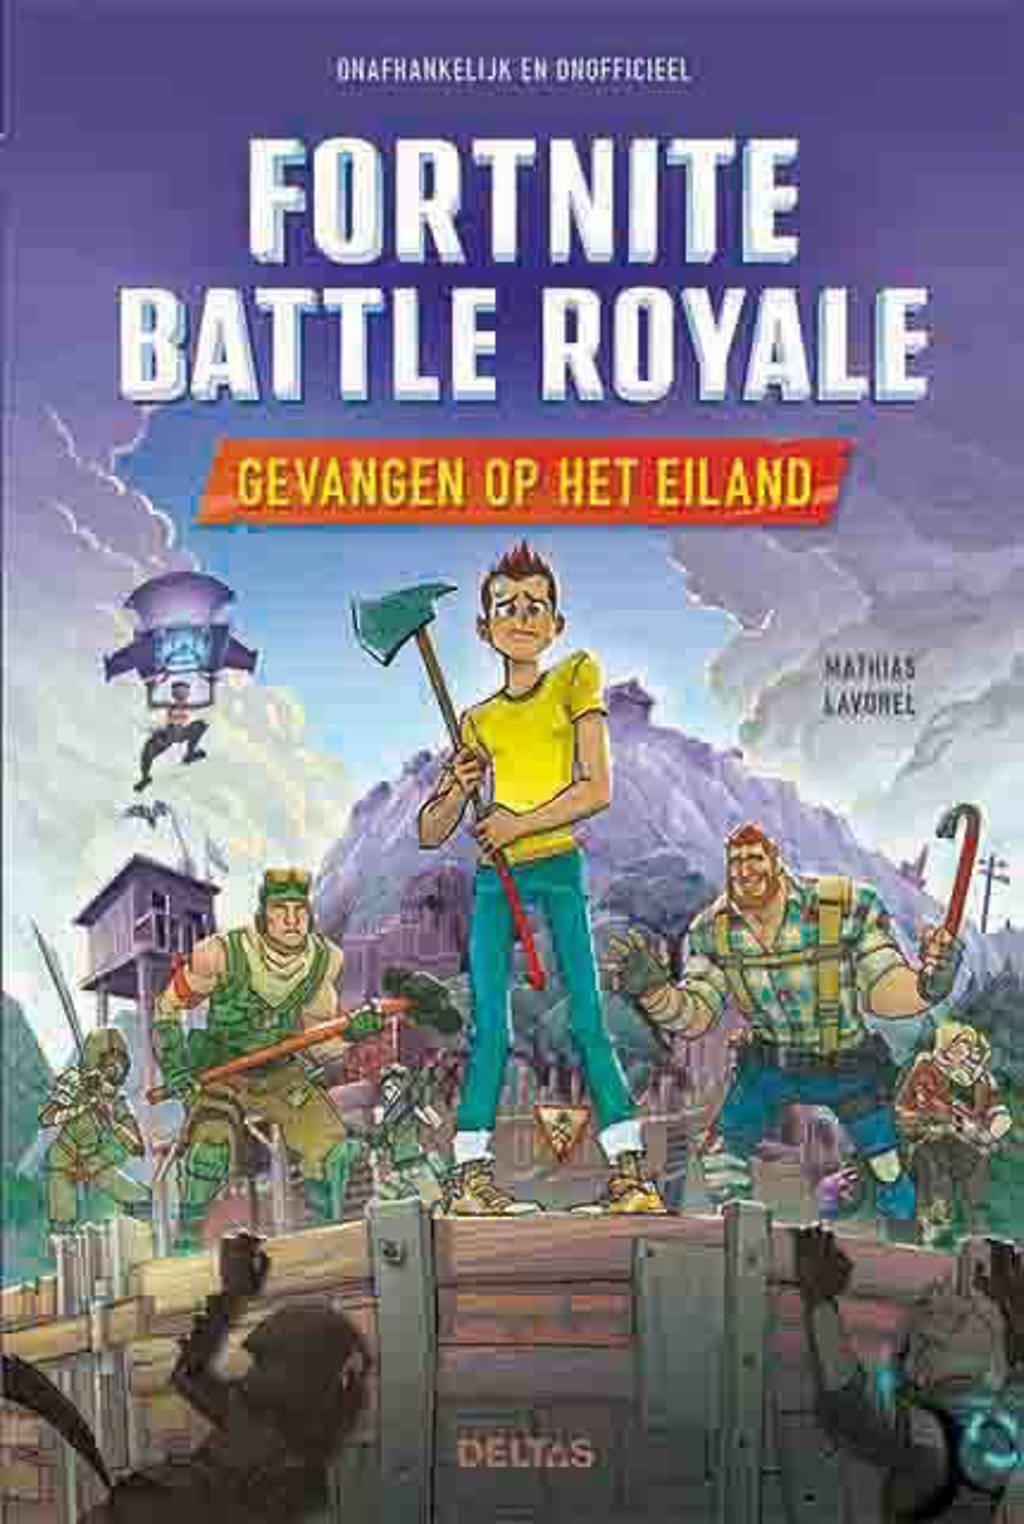 Fortnite Battle Royale: Gevangen op het eiland - Mathias Lavorel